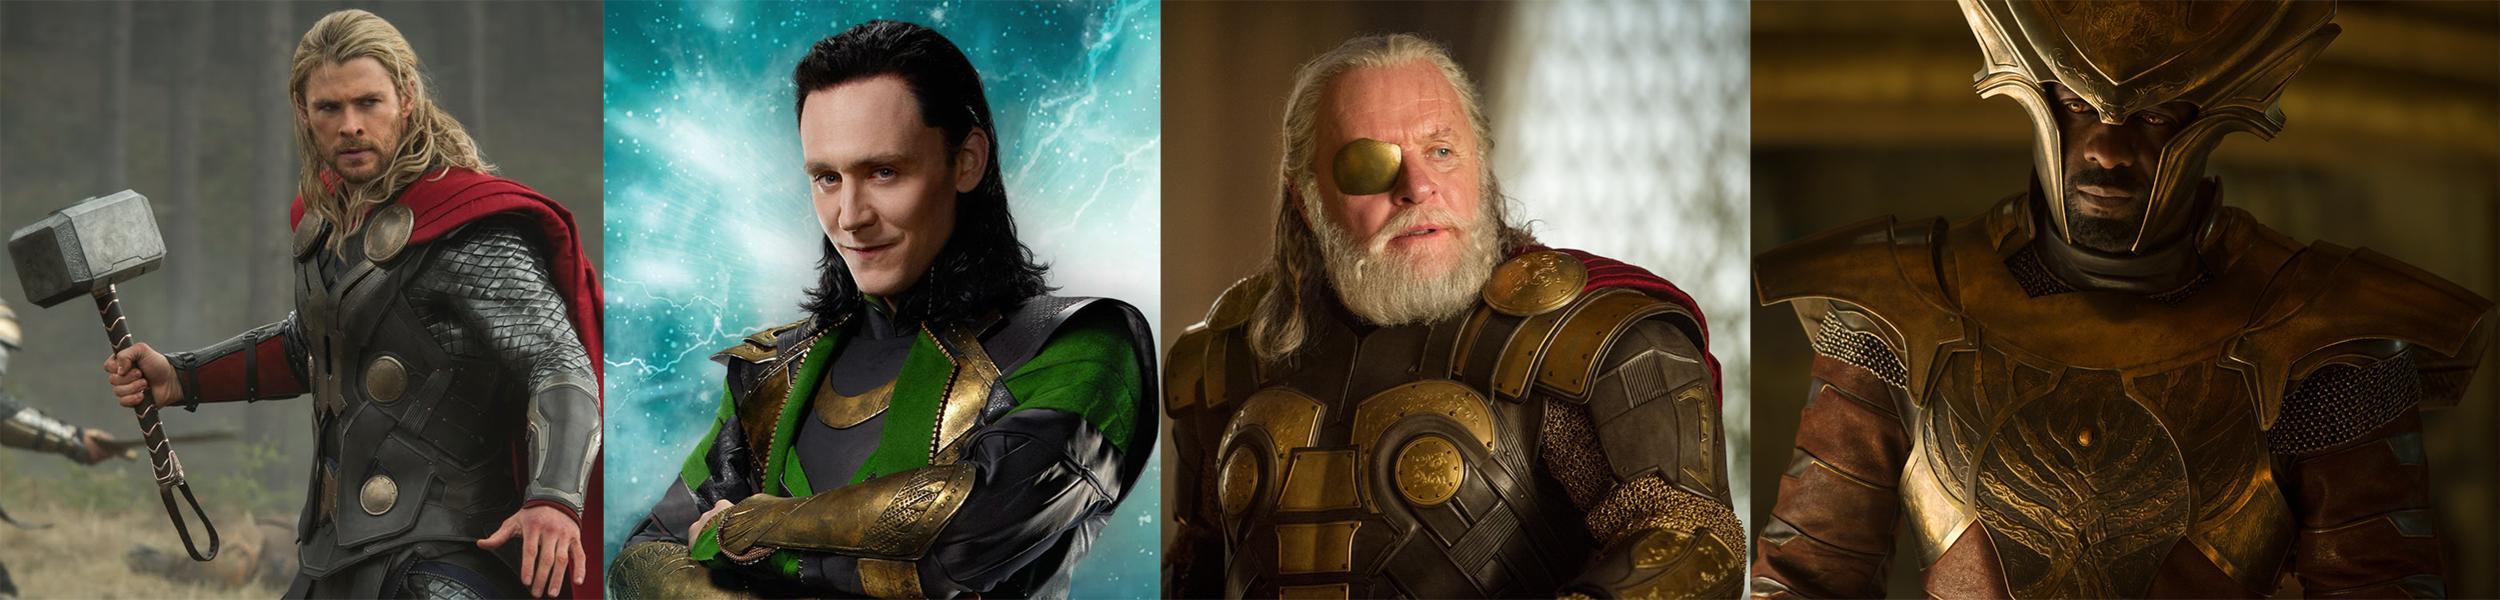 Chris Hemsworth(Thor),Tom Hiddleston(Loki),Anthony Hopkins(Odin) and Idris Elba(Heimdall).